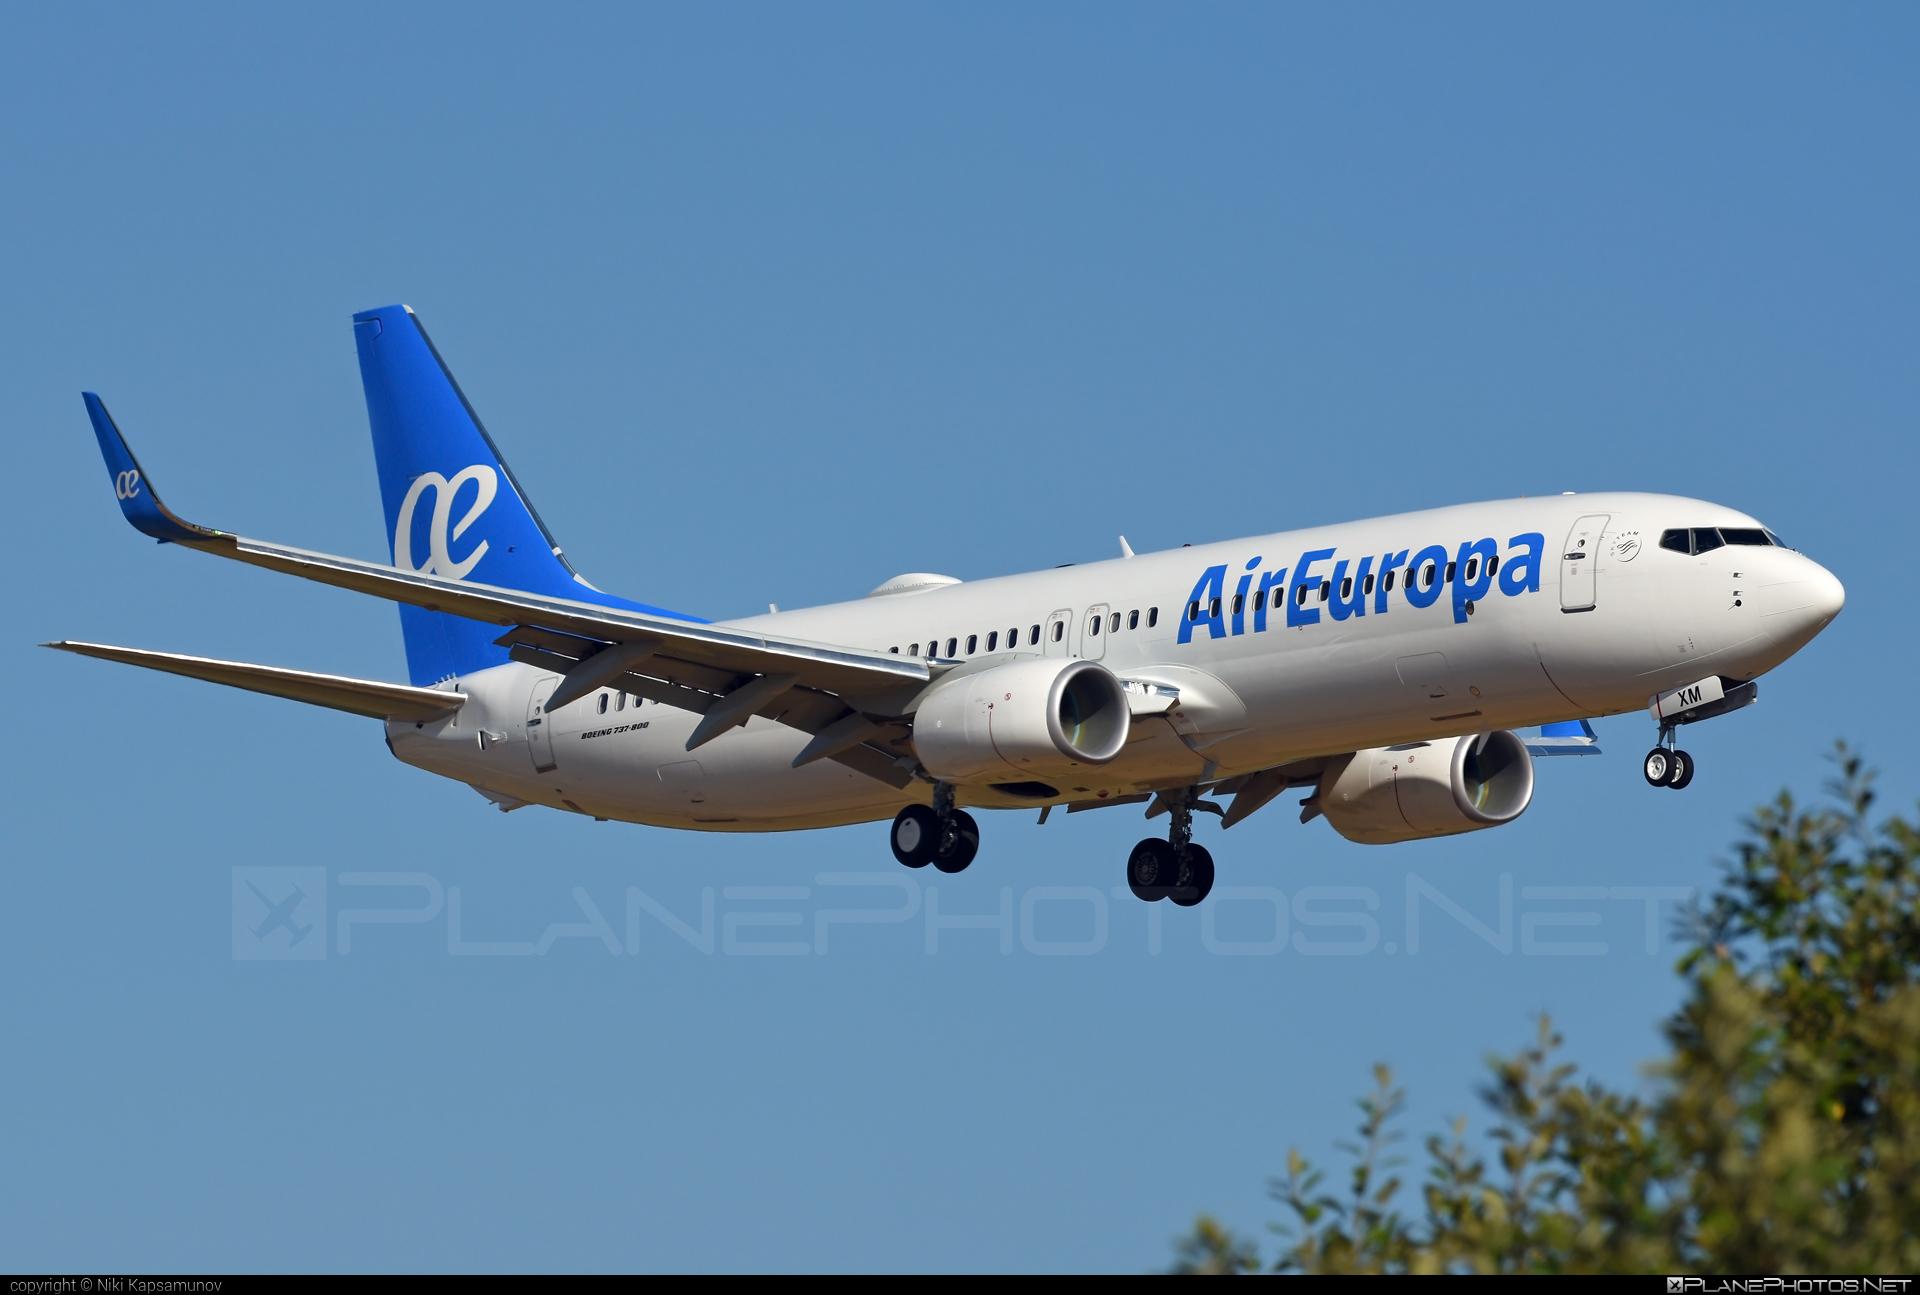 Boeing 737-800 - EC-MXM operated by Air Europa #b737 #b737nextgen #b737ng #boeing #boeing737